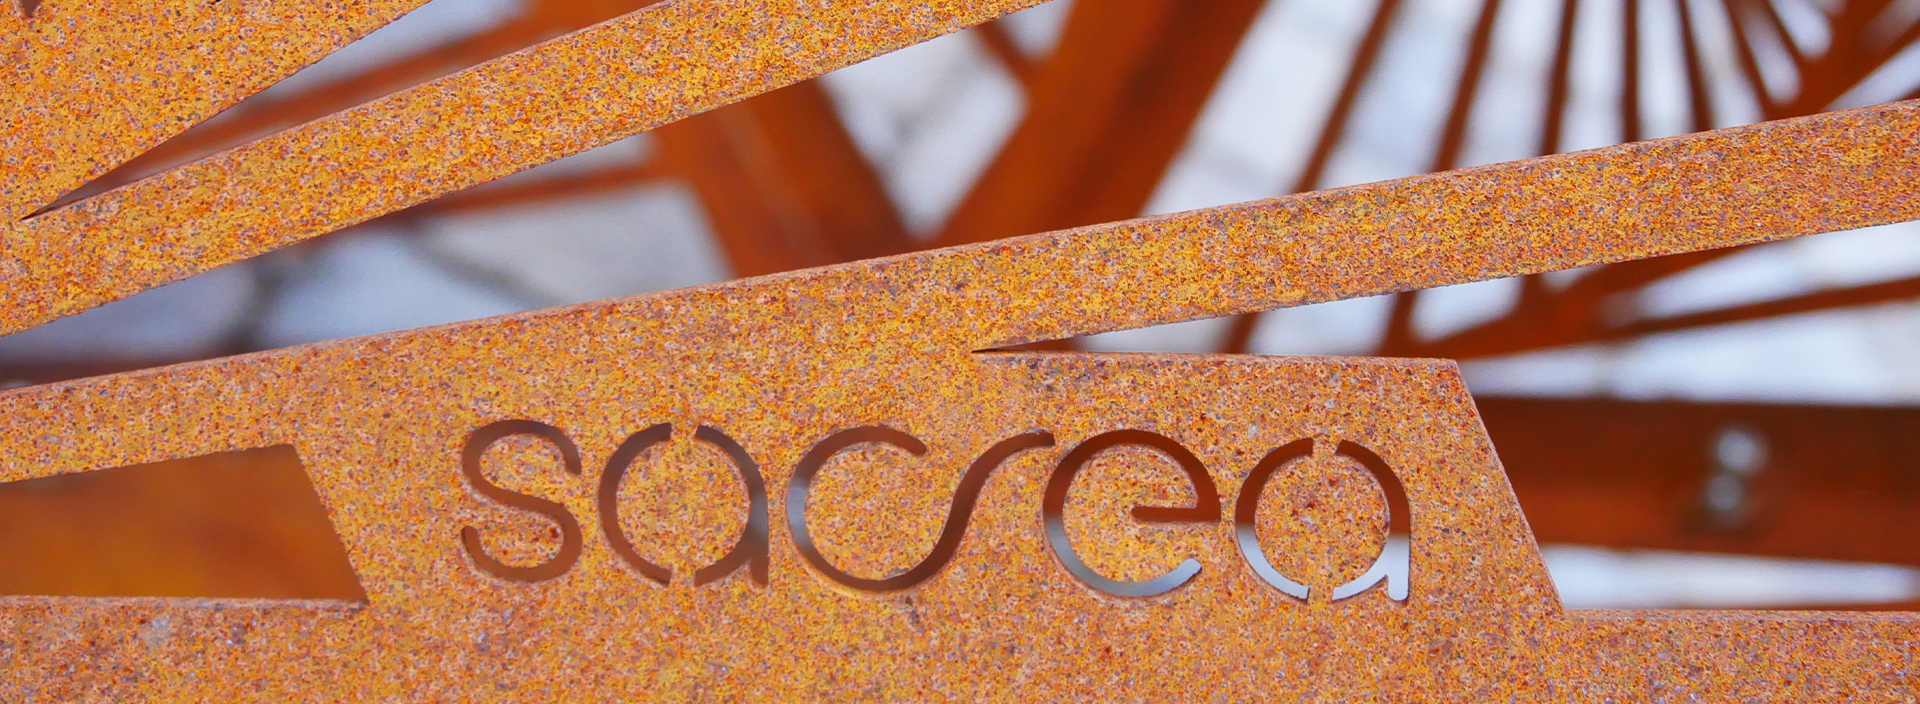 Sacrea Produkt-Bild: 1-home-header-sacrea-metal-logo